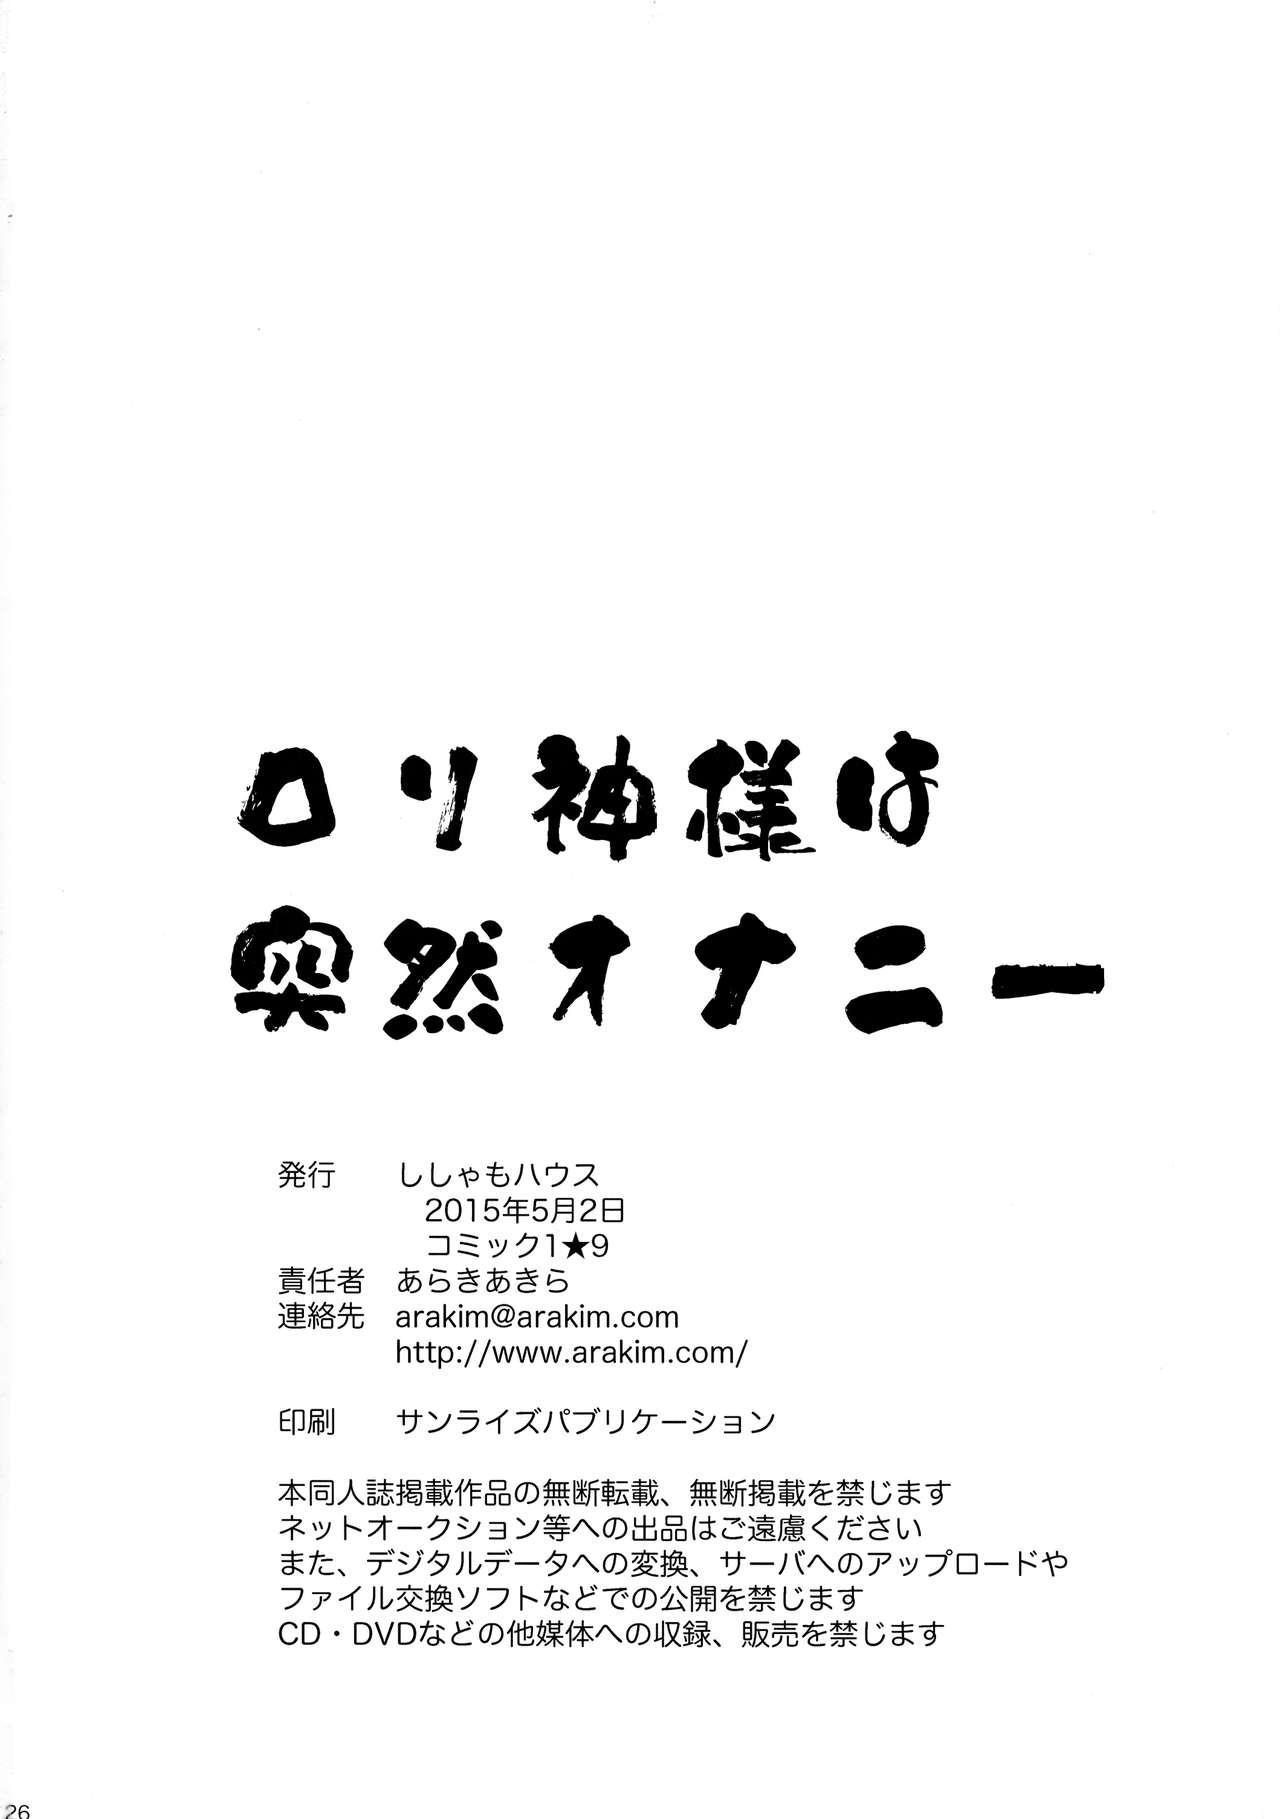 Loli Kami-sama wa Totsuzen Onanie 25